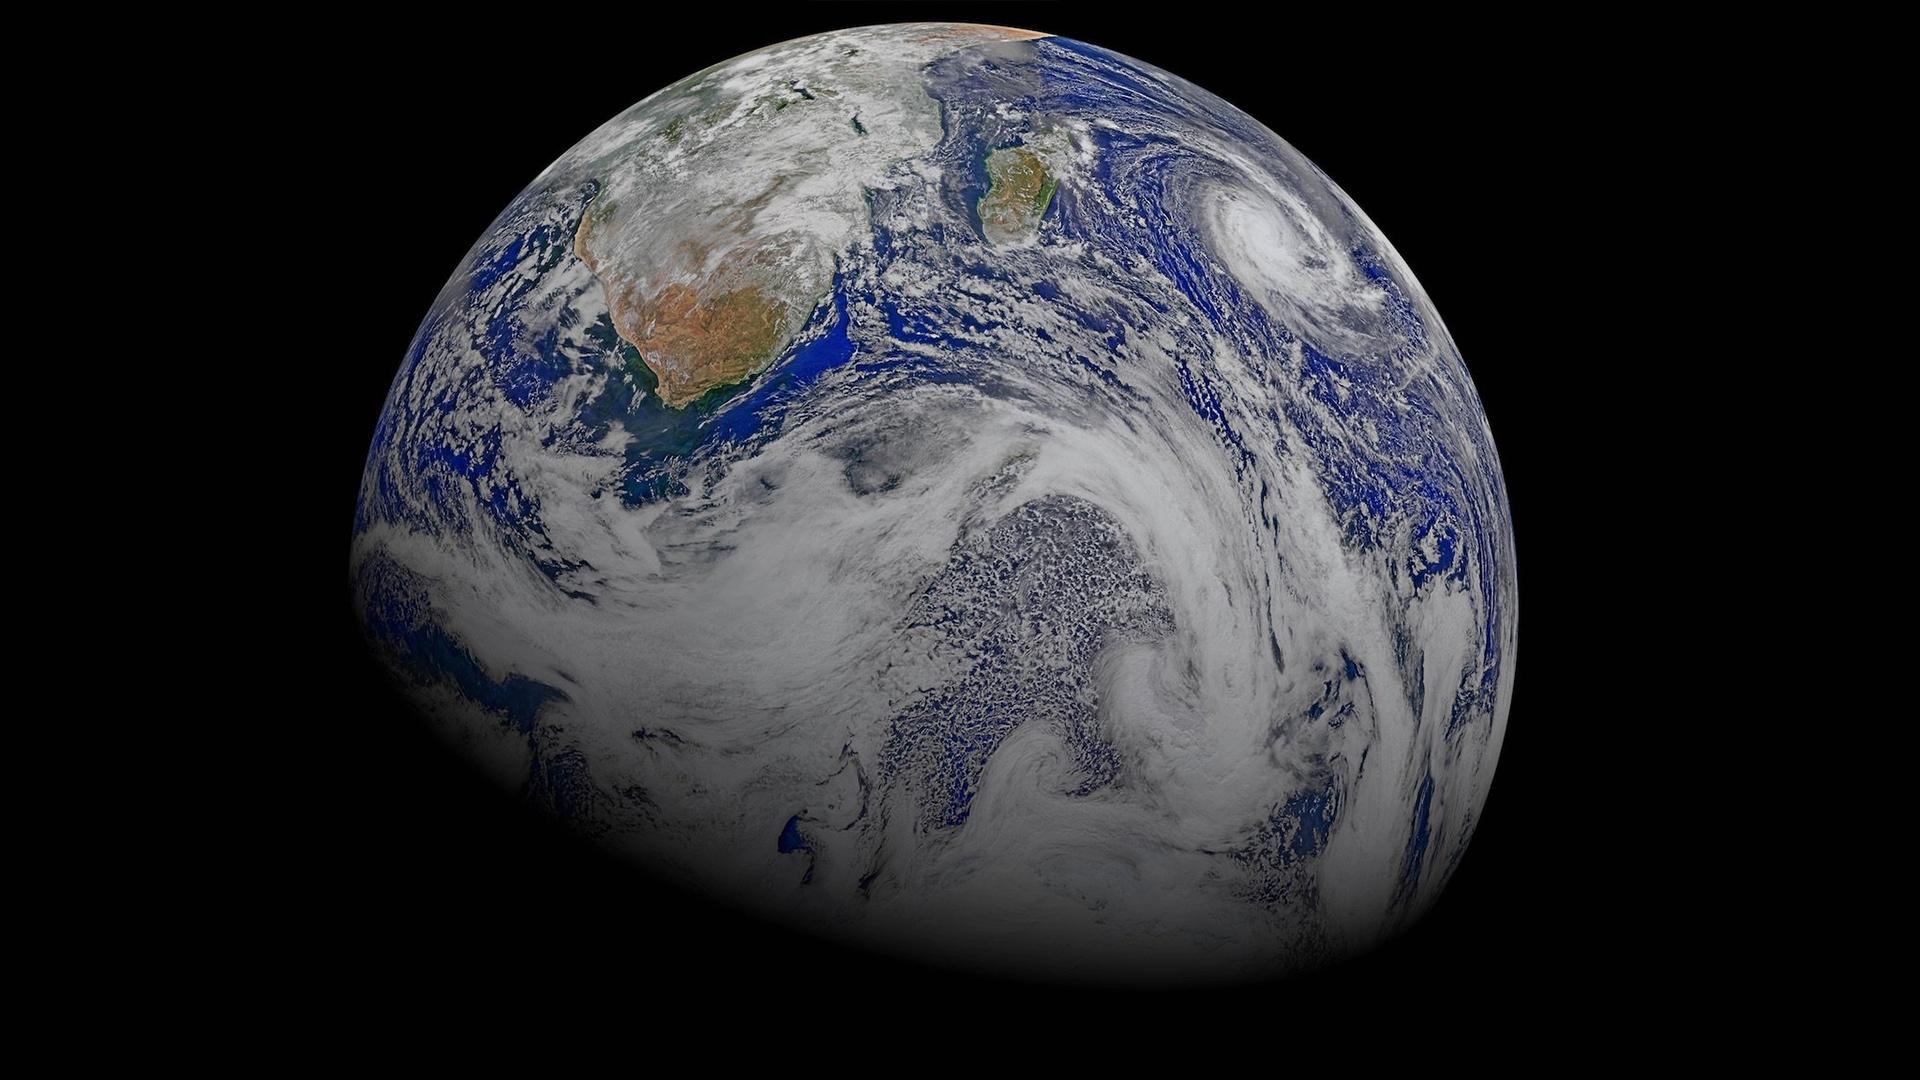 planet-earth-16x9.jpg